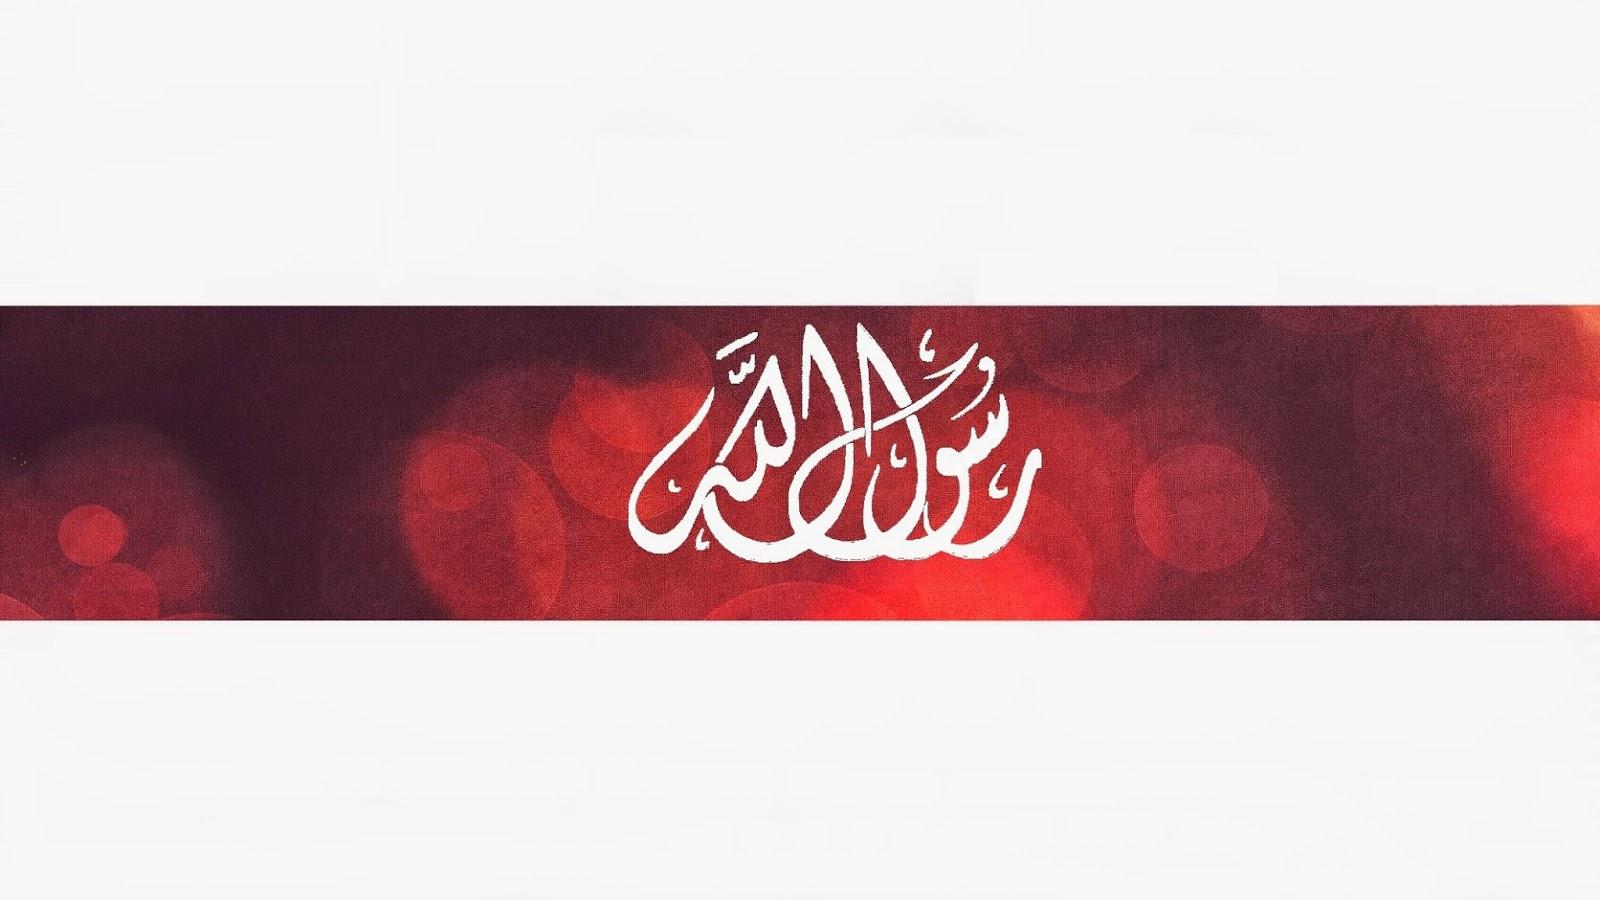 بالصور يوتيوب اسلامي , افضل مقطع اسلاميه على يوتيوب 2637